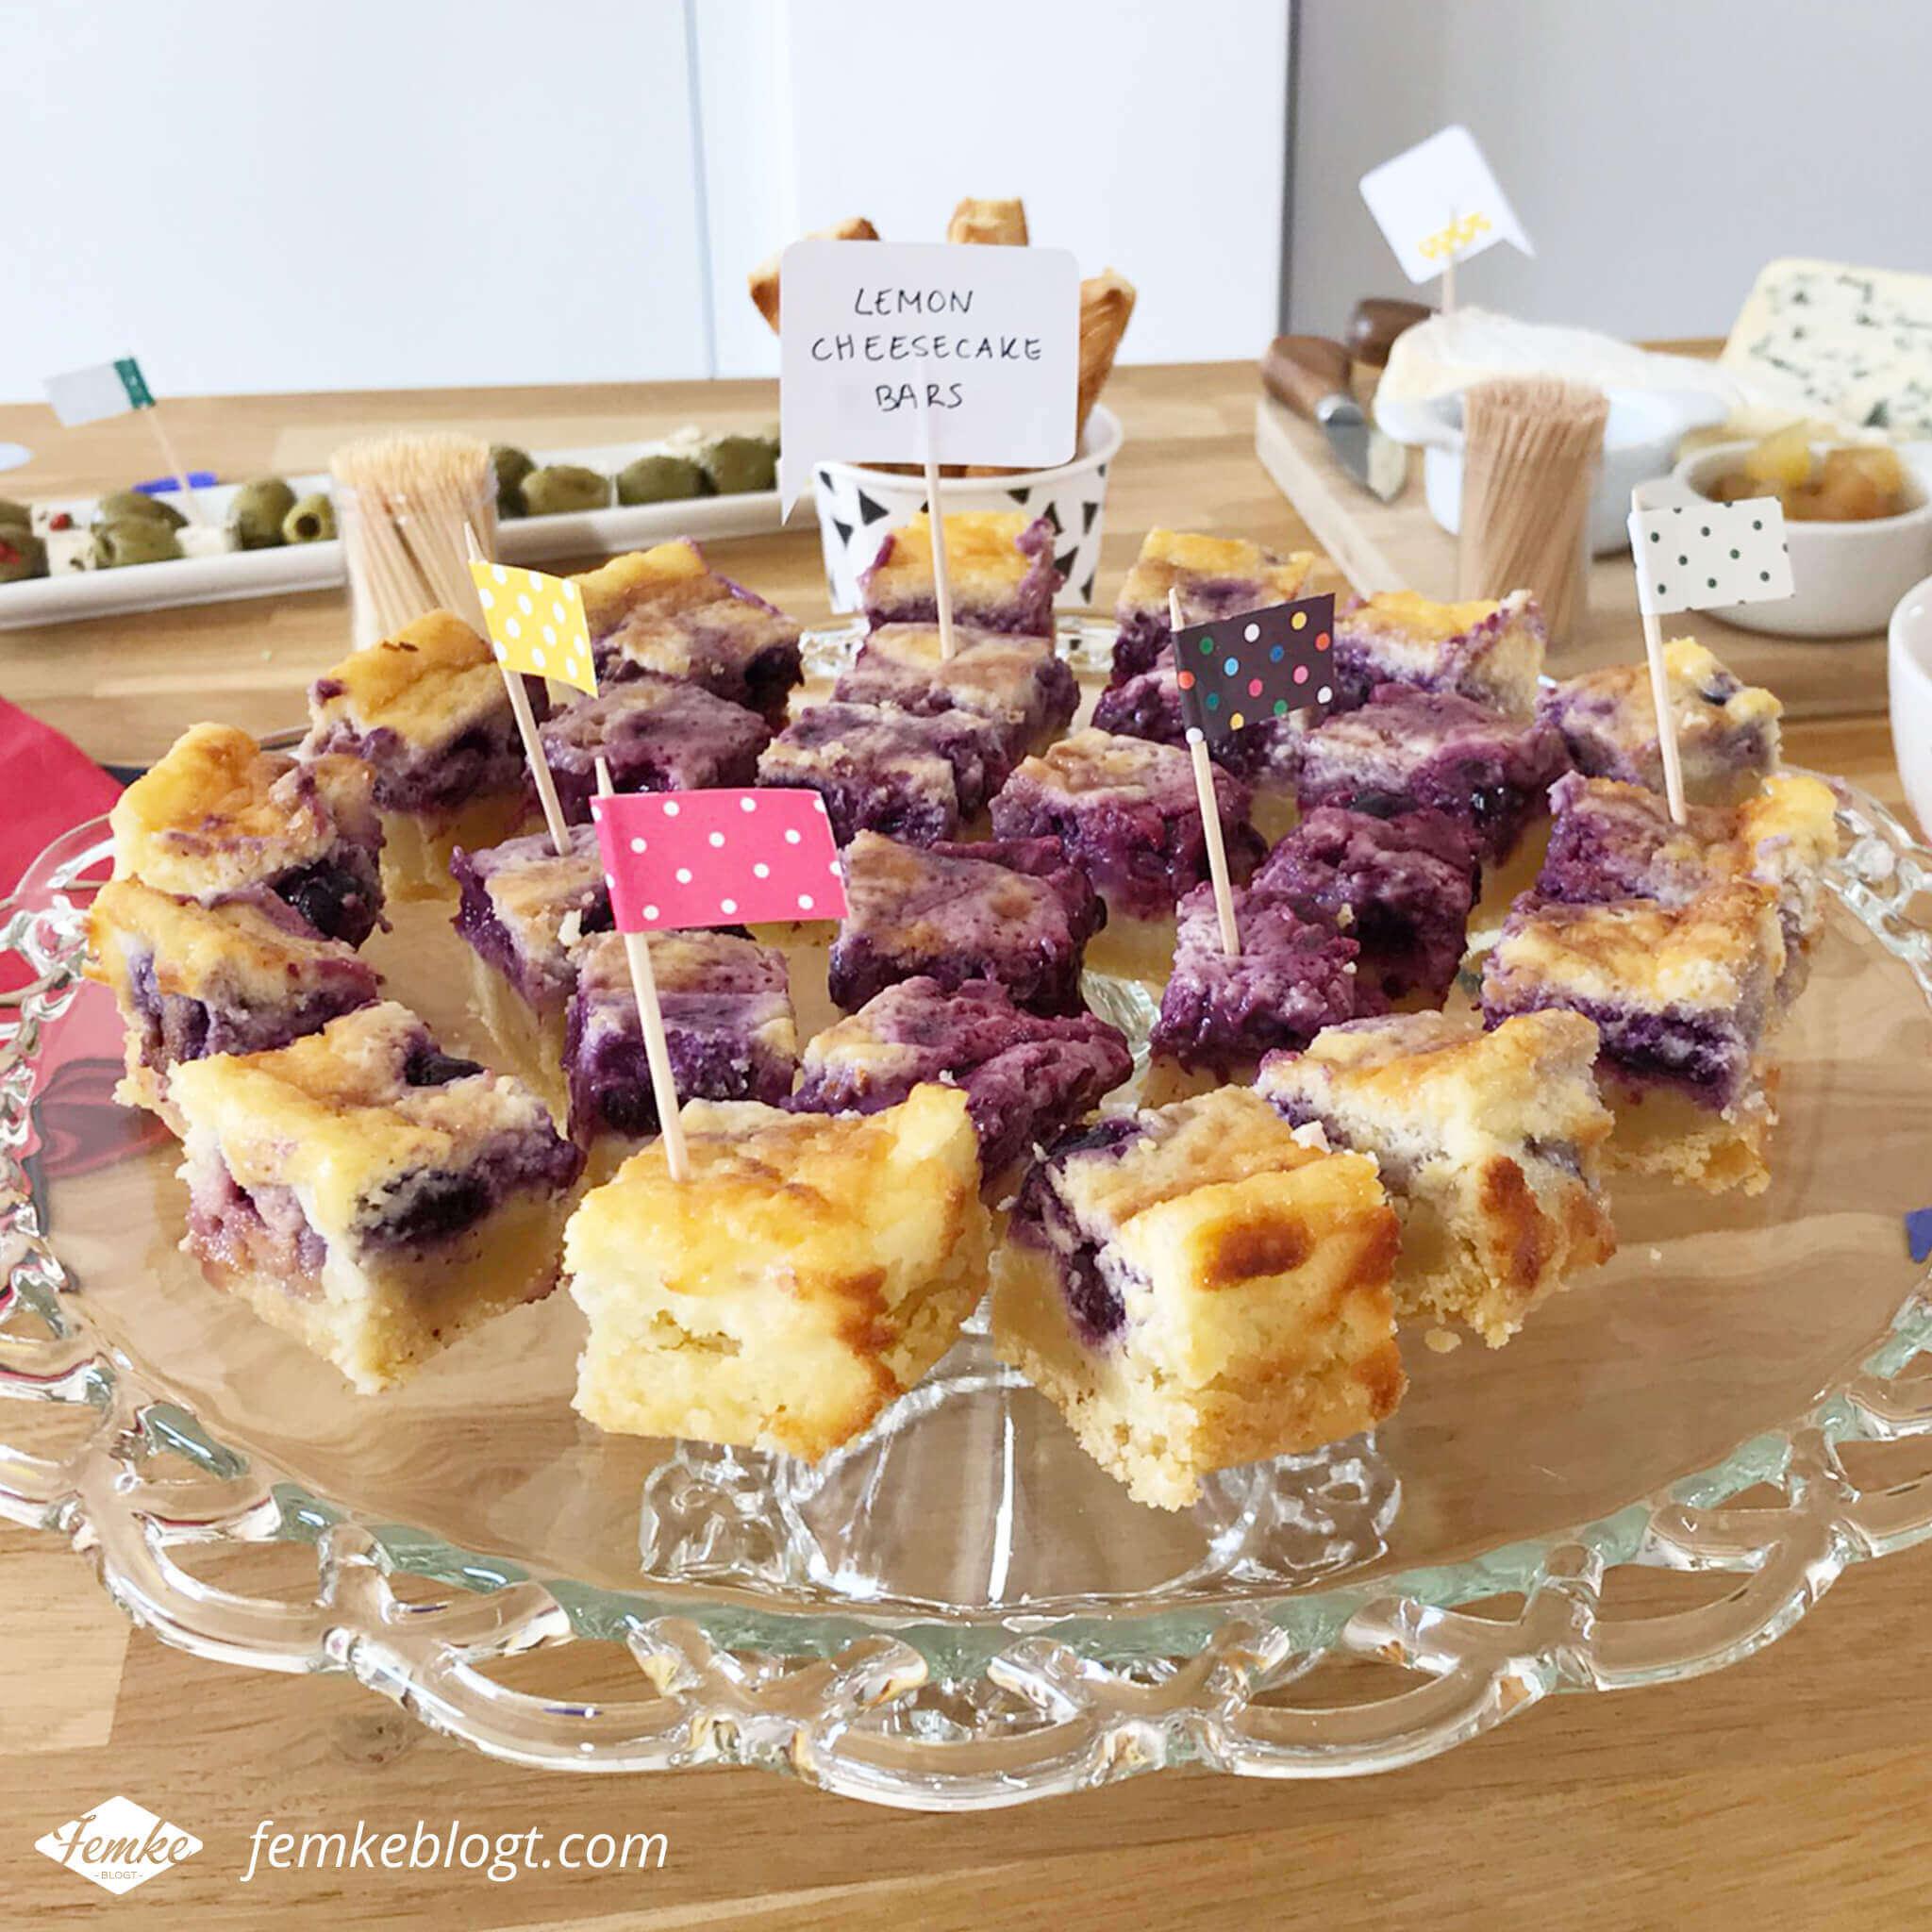 Onze housewarming | Cheesecake bars met zelfgemaakte prikkers